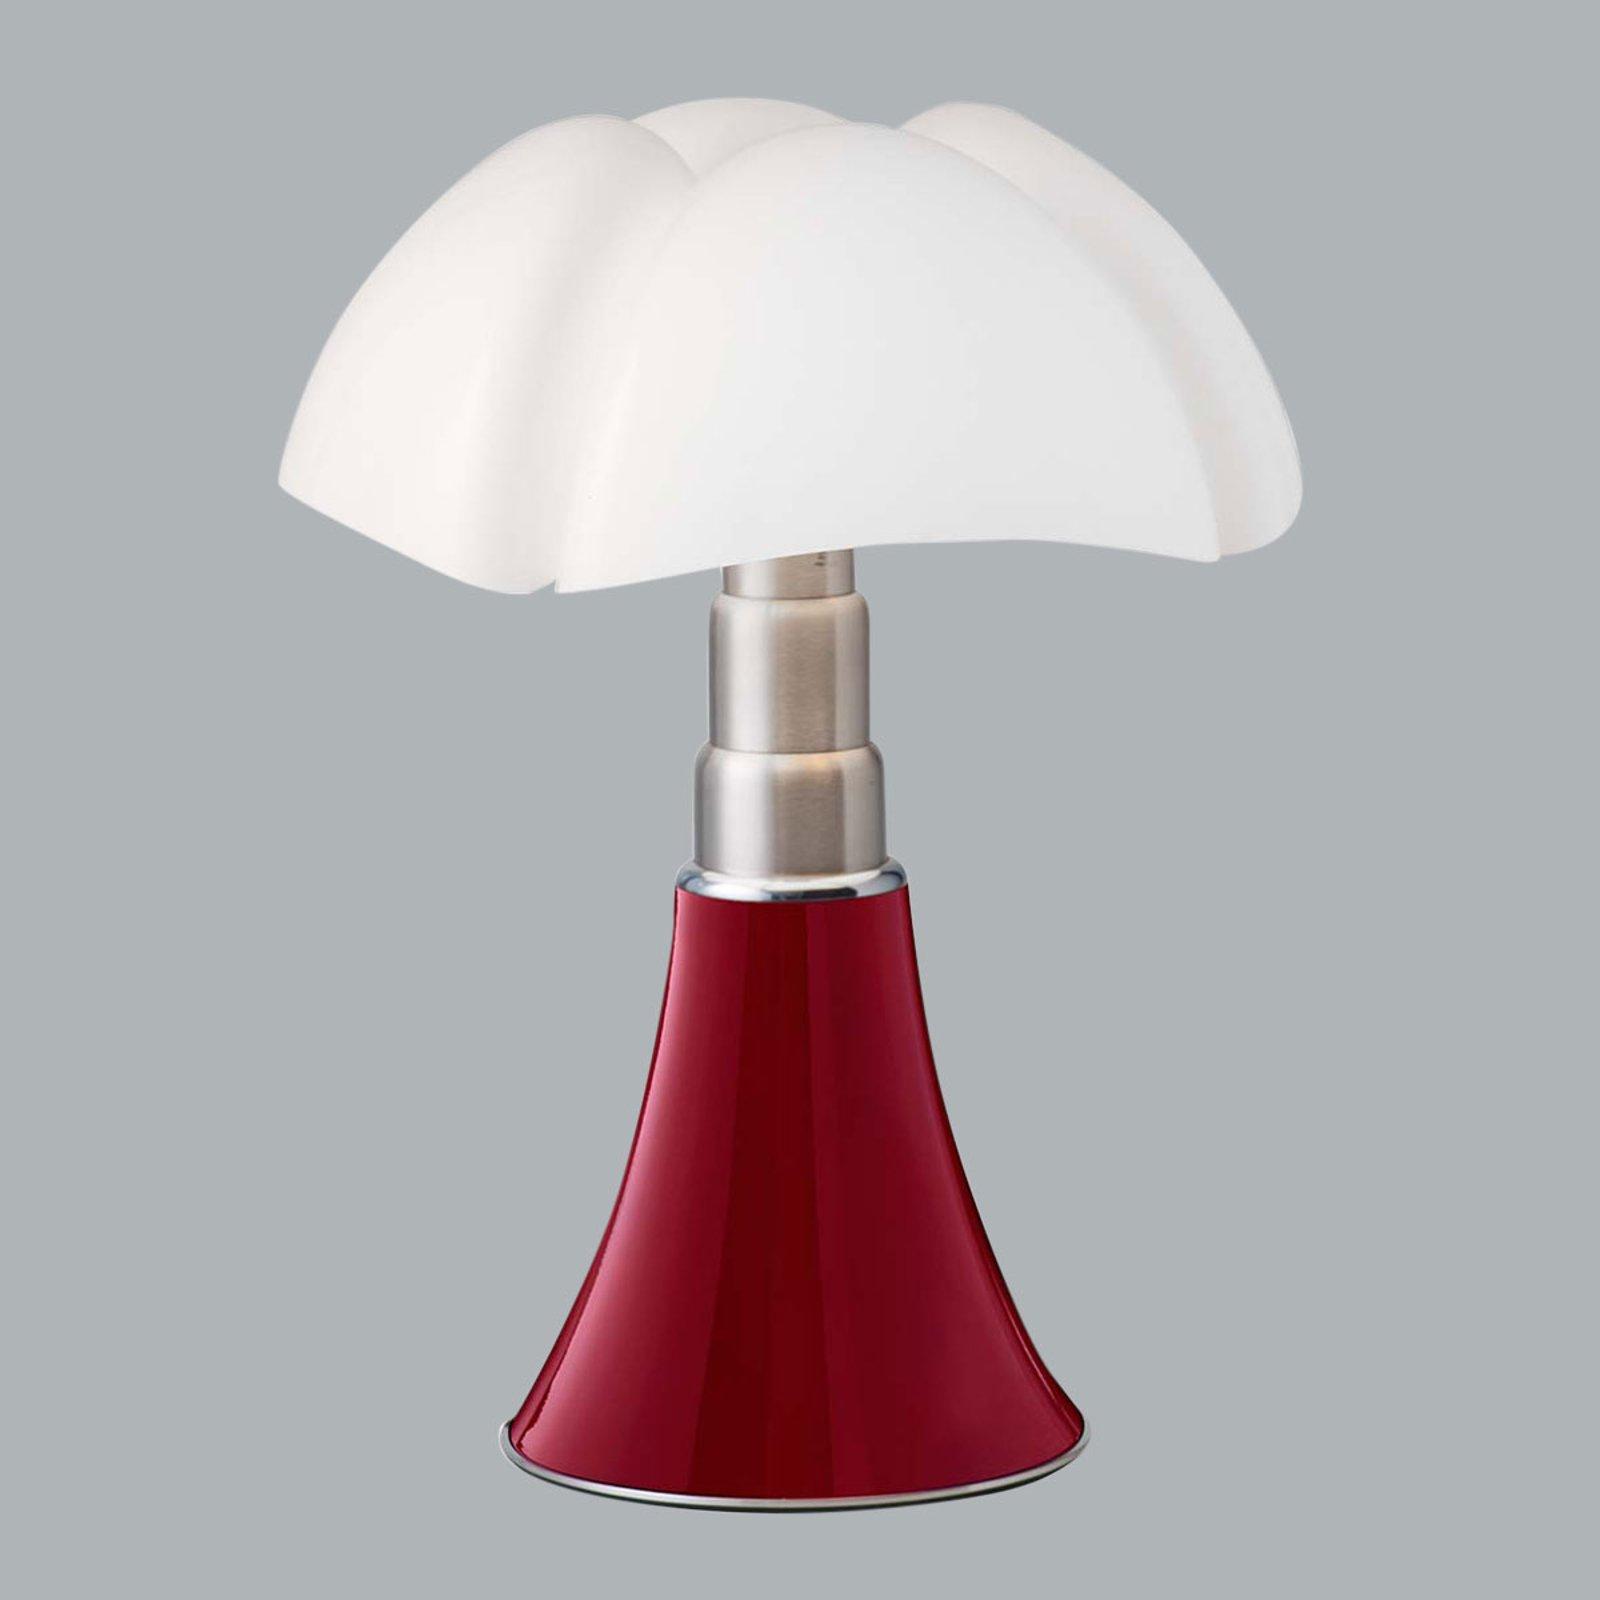 Martinelli Luce Minipipistrello bordlampe rød